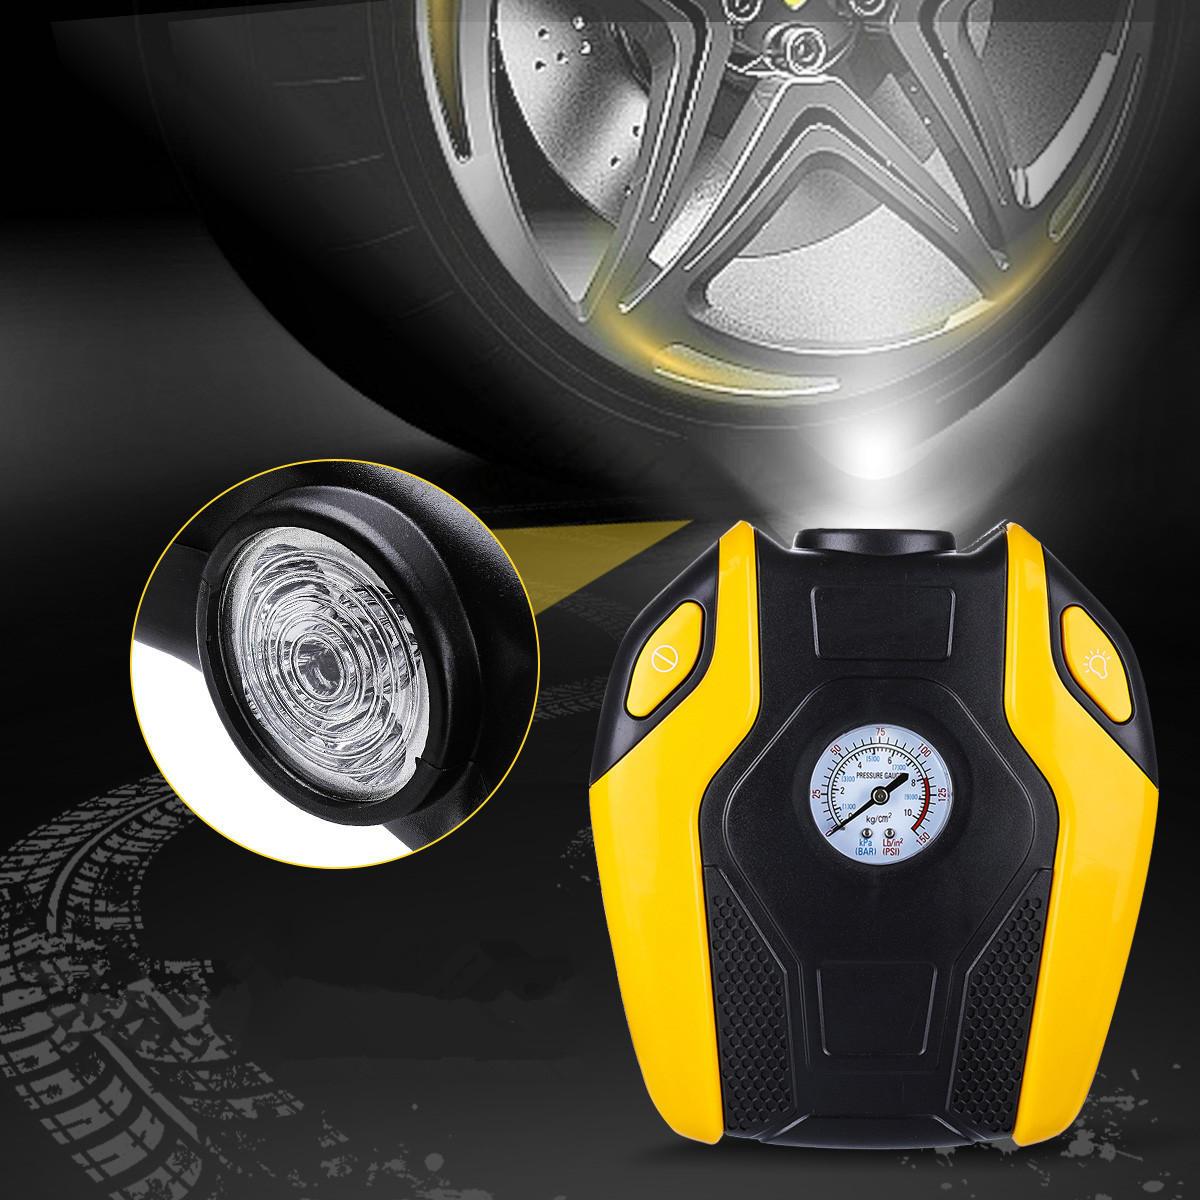 Wireless Car TPMS Tire Tyre Pressure Monitor System + 4 Sensor Cigarette Lighter - 3